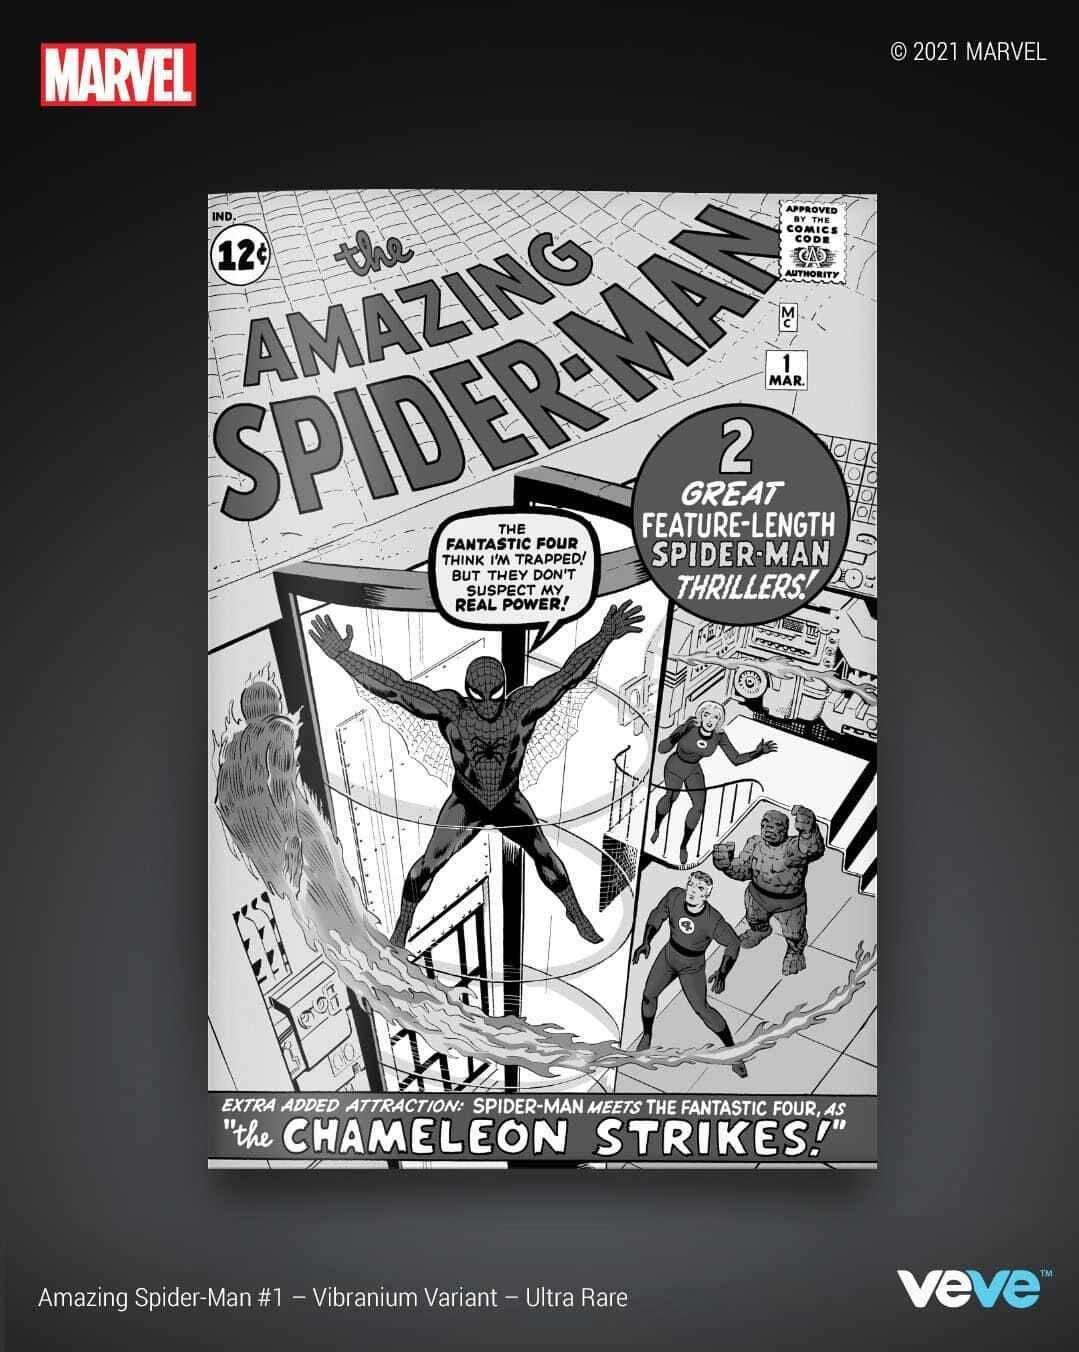 cmc-marvel-amazing-spider-man-01-ultrarare-4_5